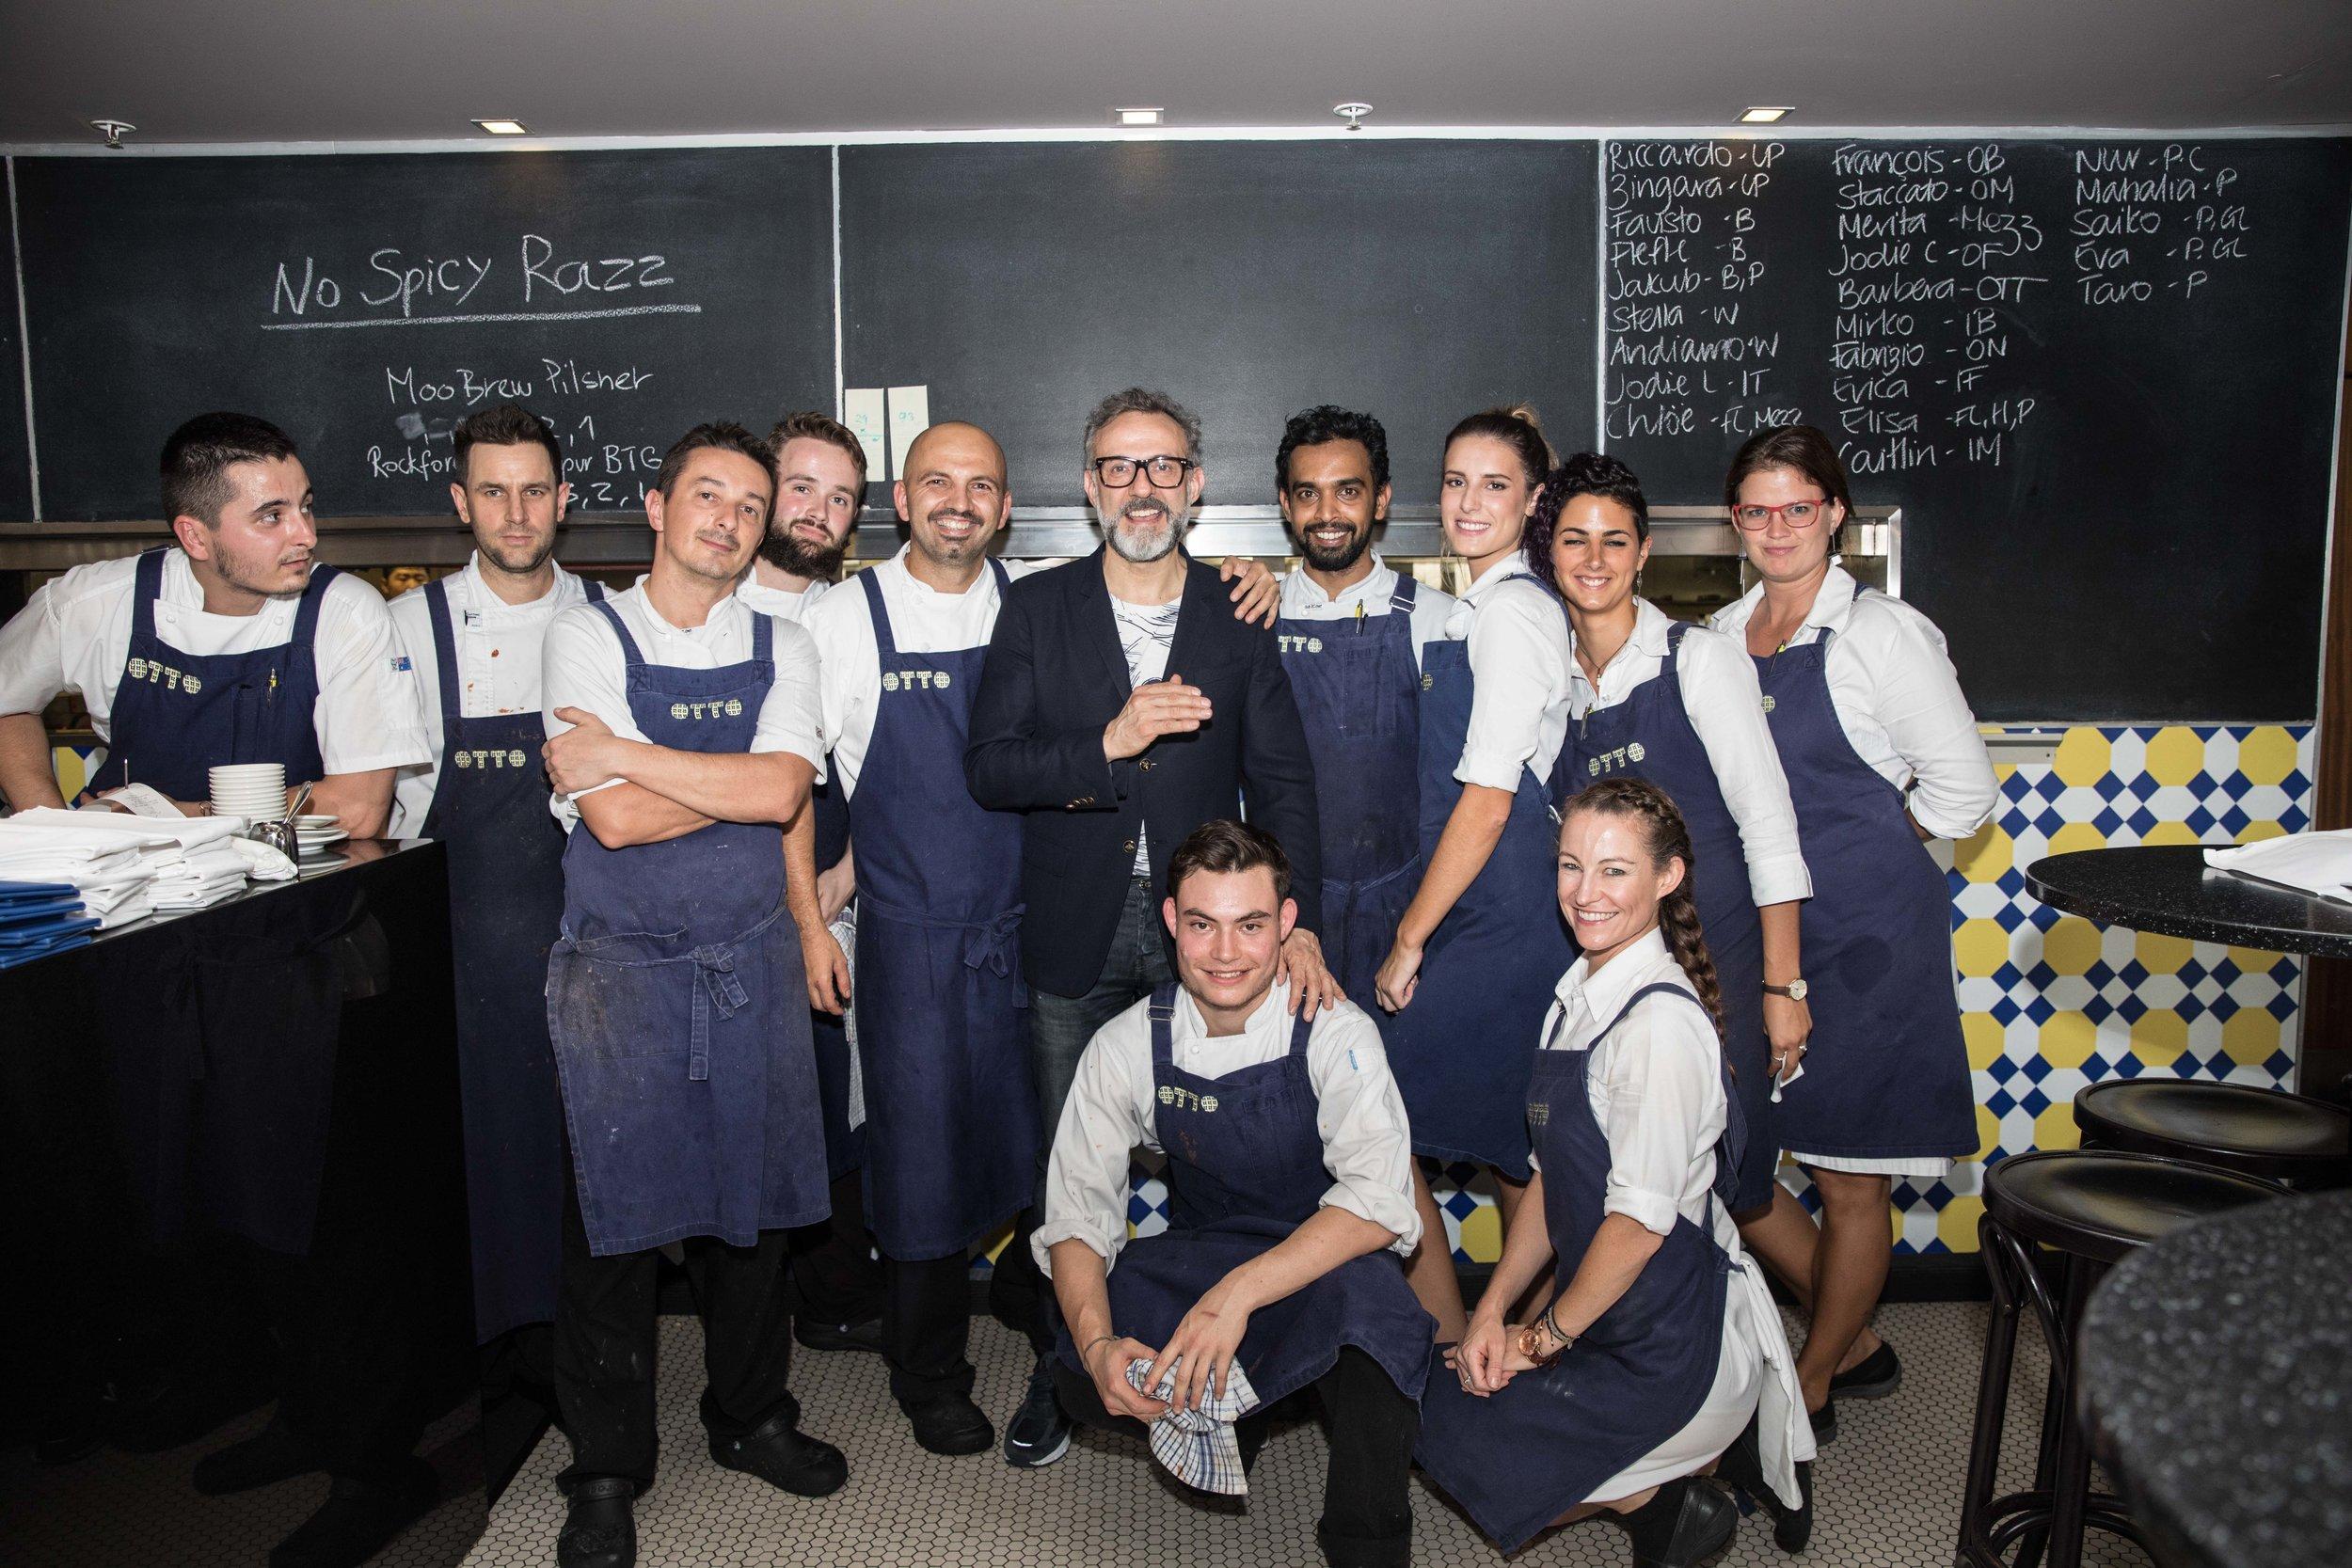 lavazza-massimo-bottura-worlds-50-best-restaurants-awards-2017-otto-team-1.jpg